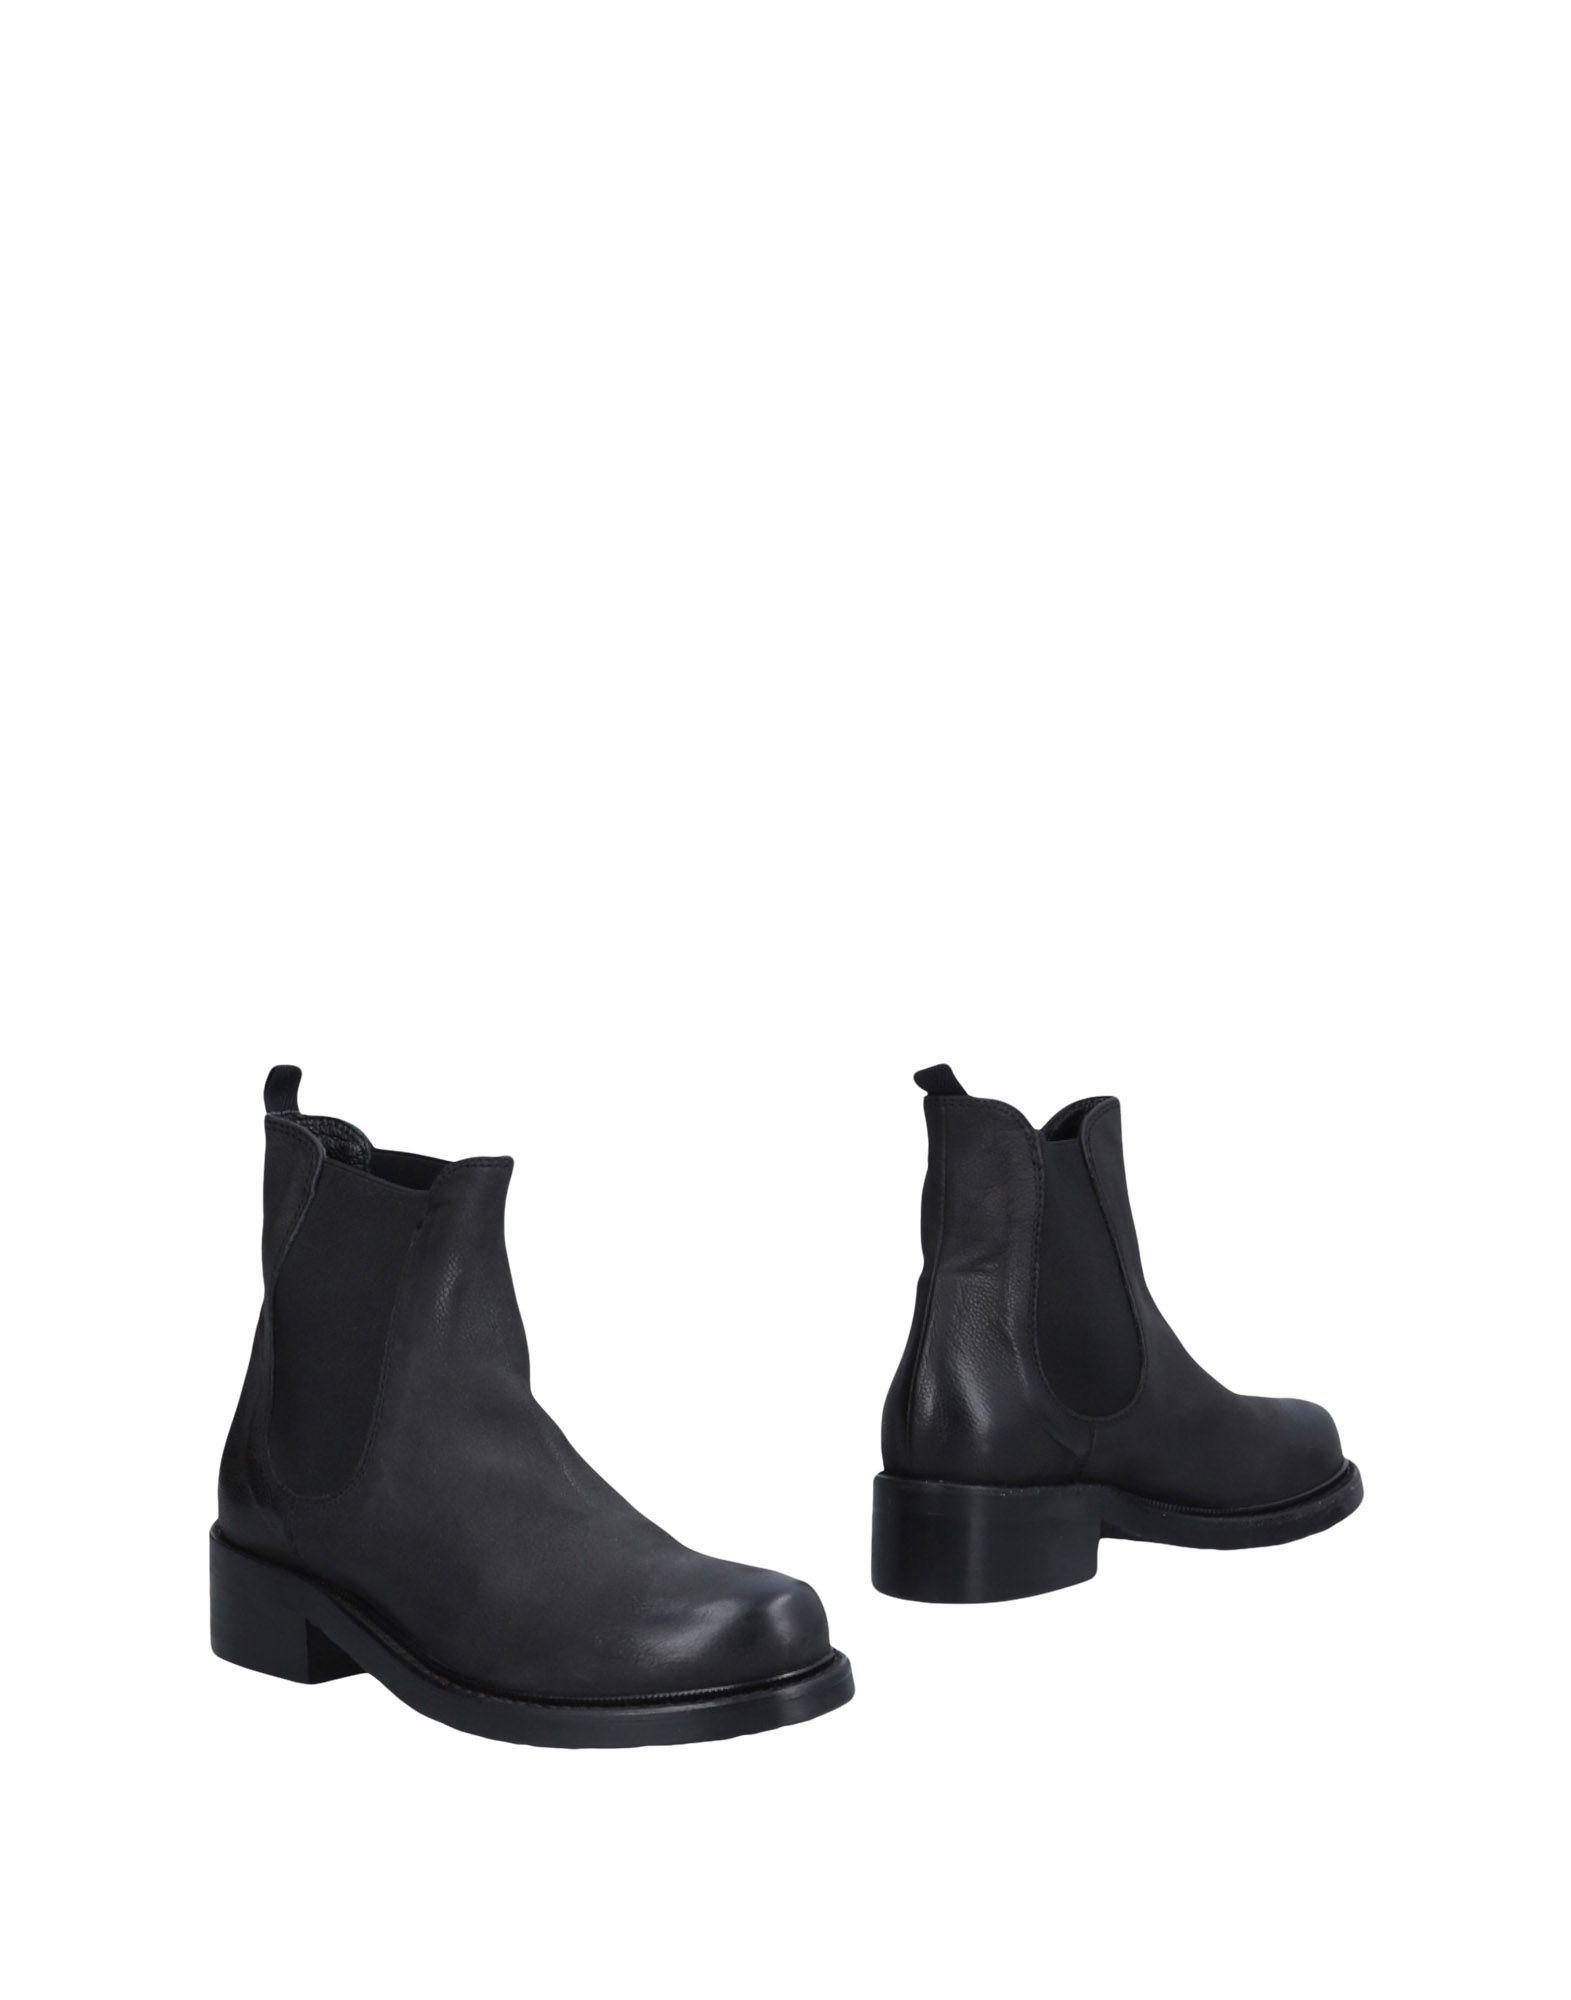 Chelsea Boots Jfk Donna - 11487540PB